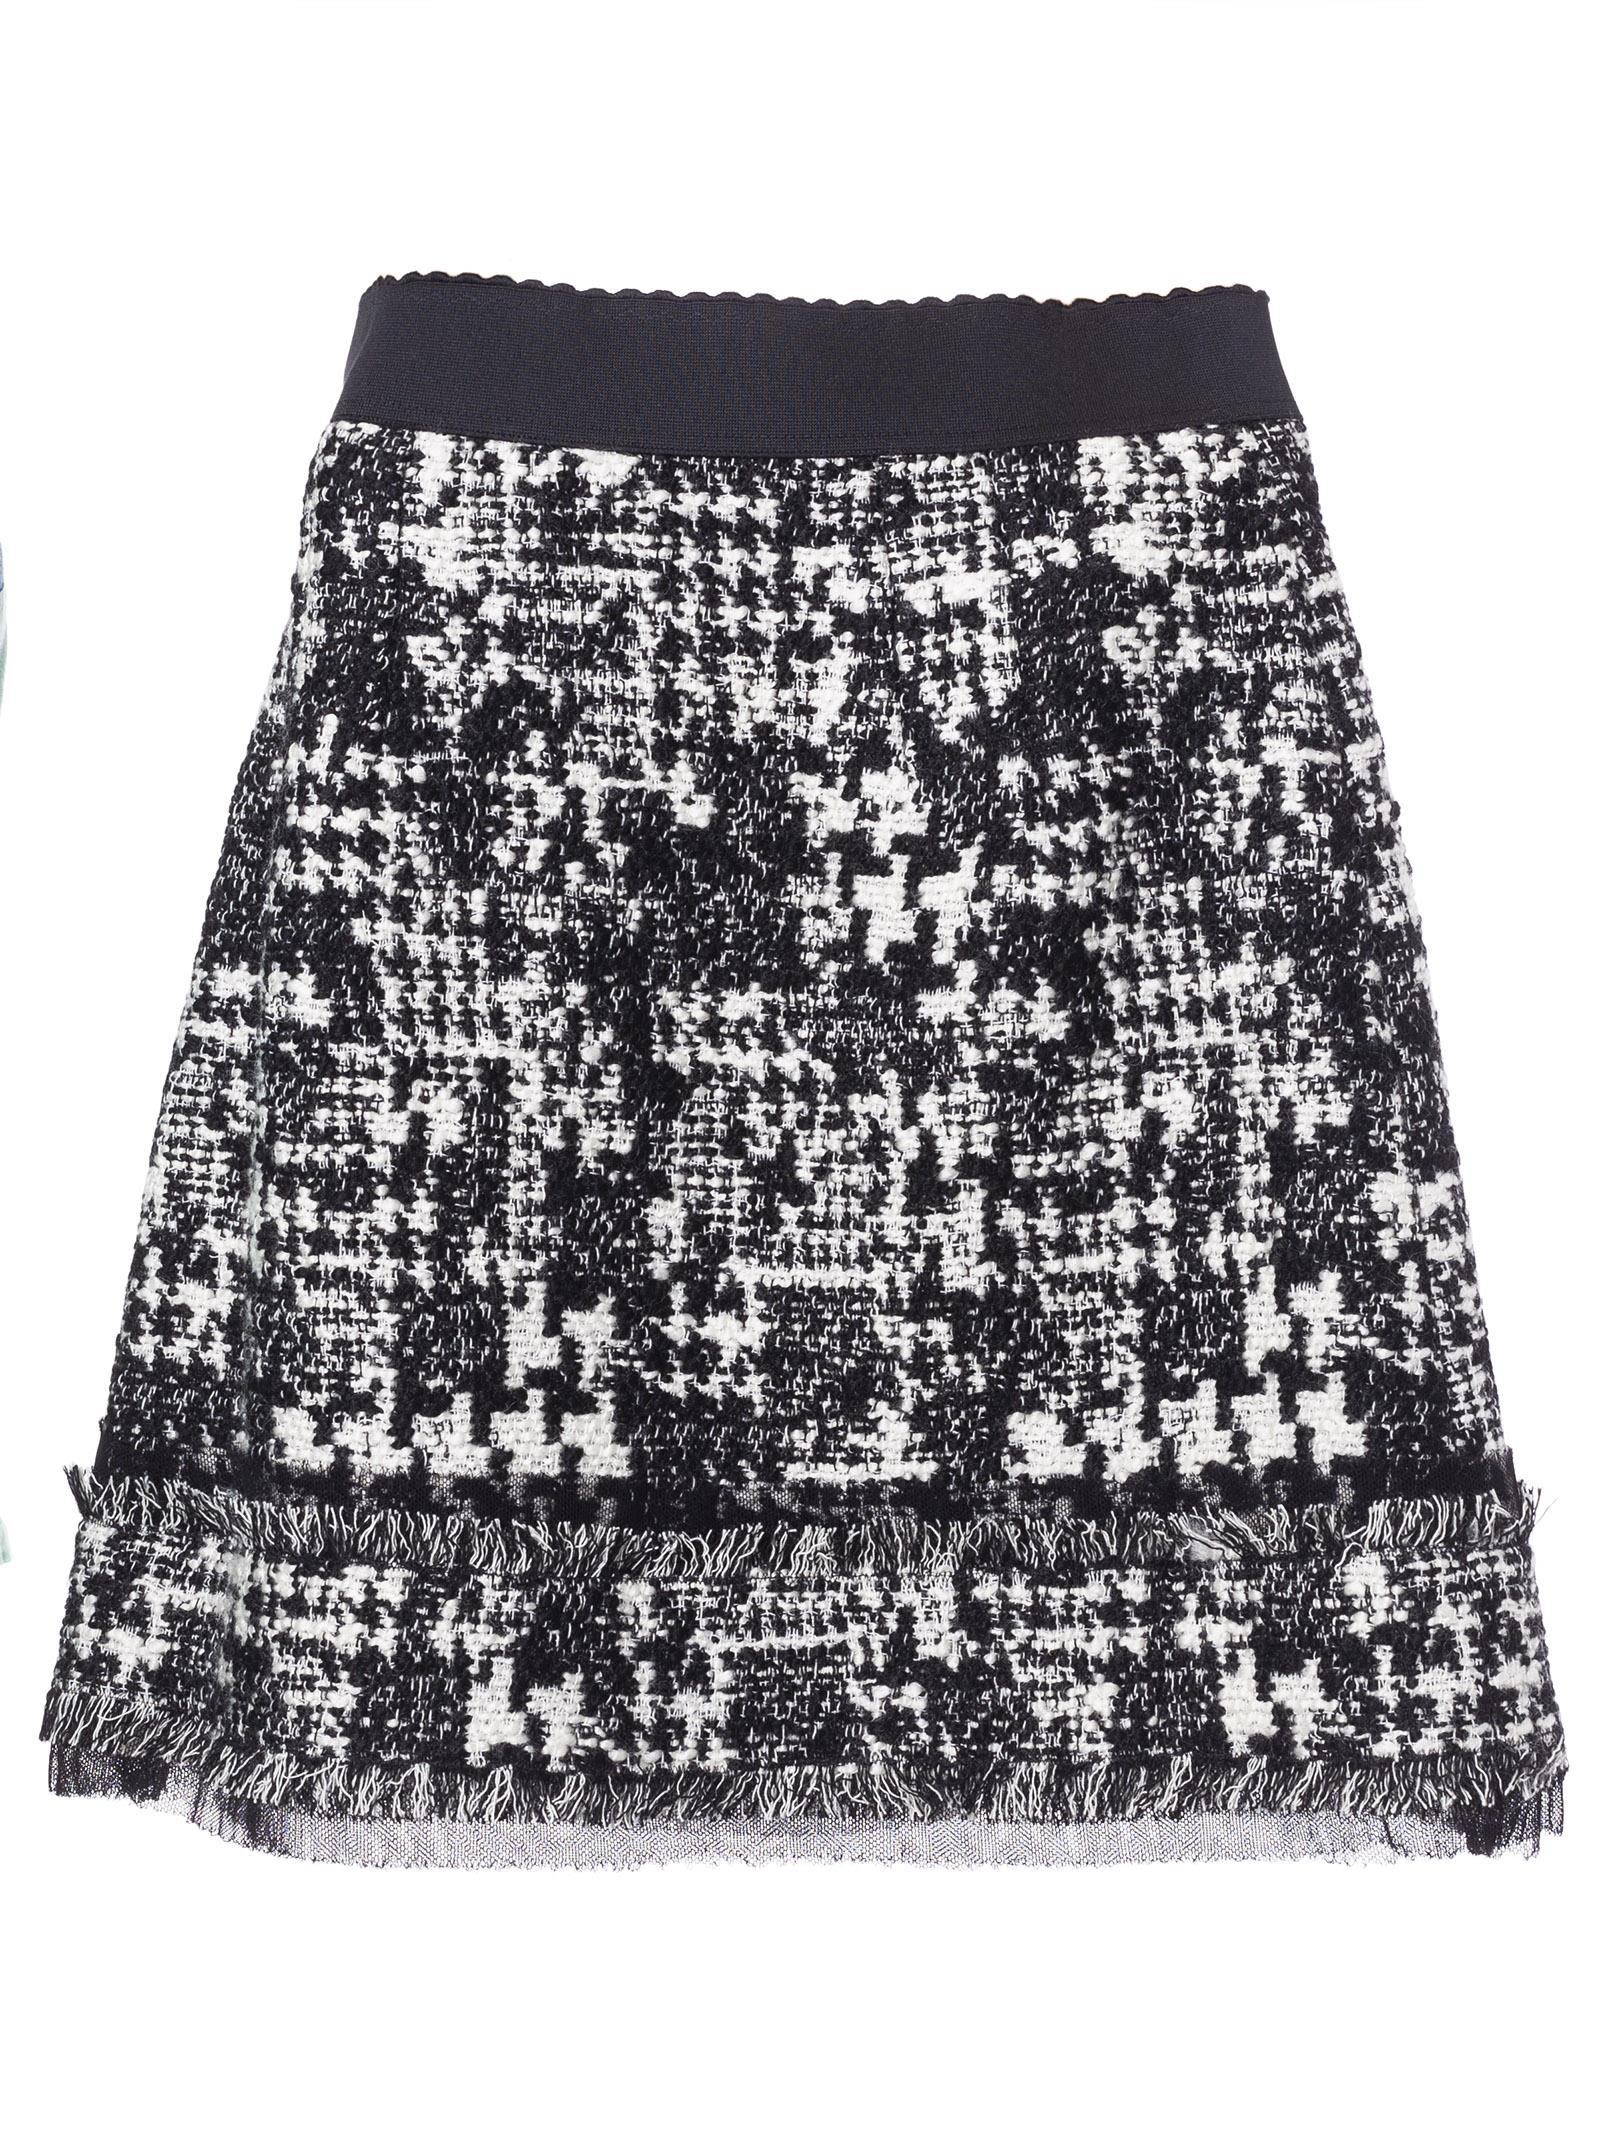 Dolce & Gabbana Fringed Mini Skirt